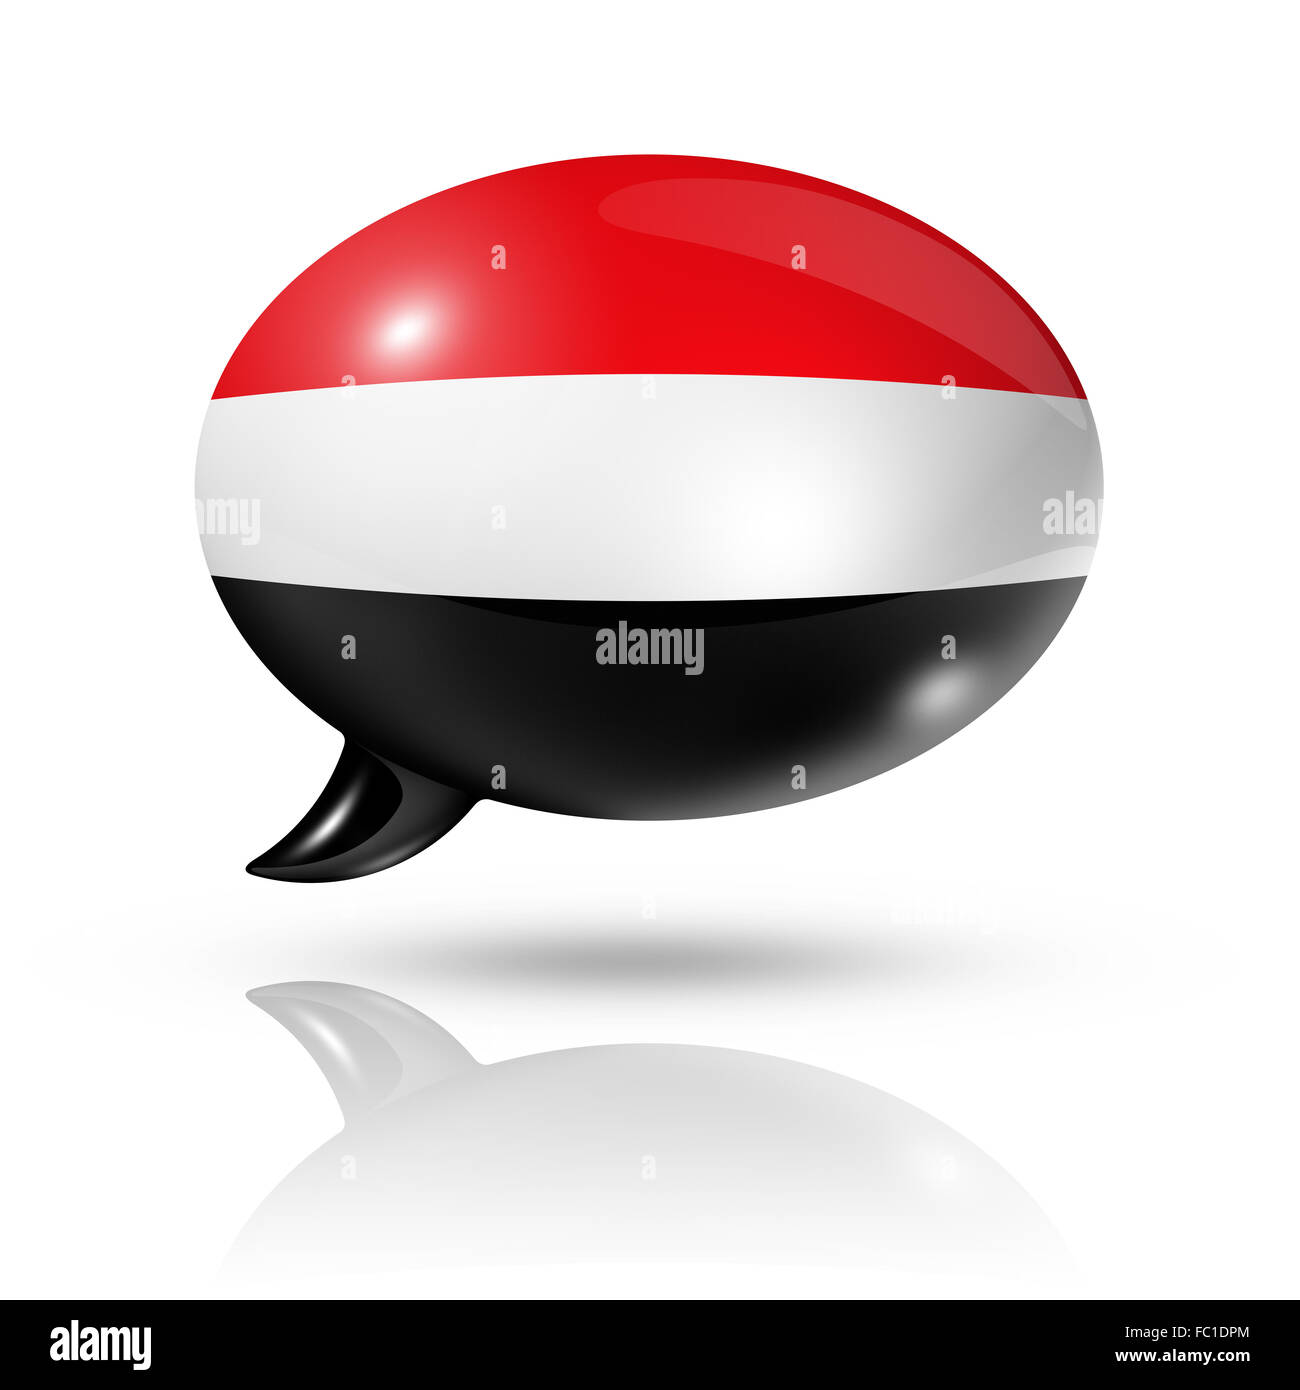 Yemen flag speech bubble - Stock Image